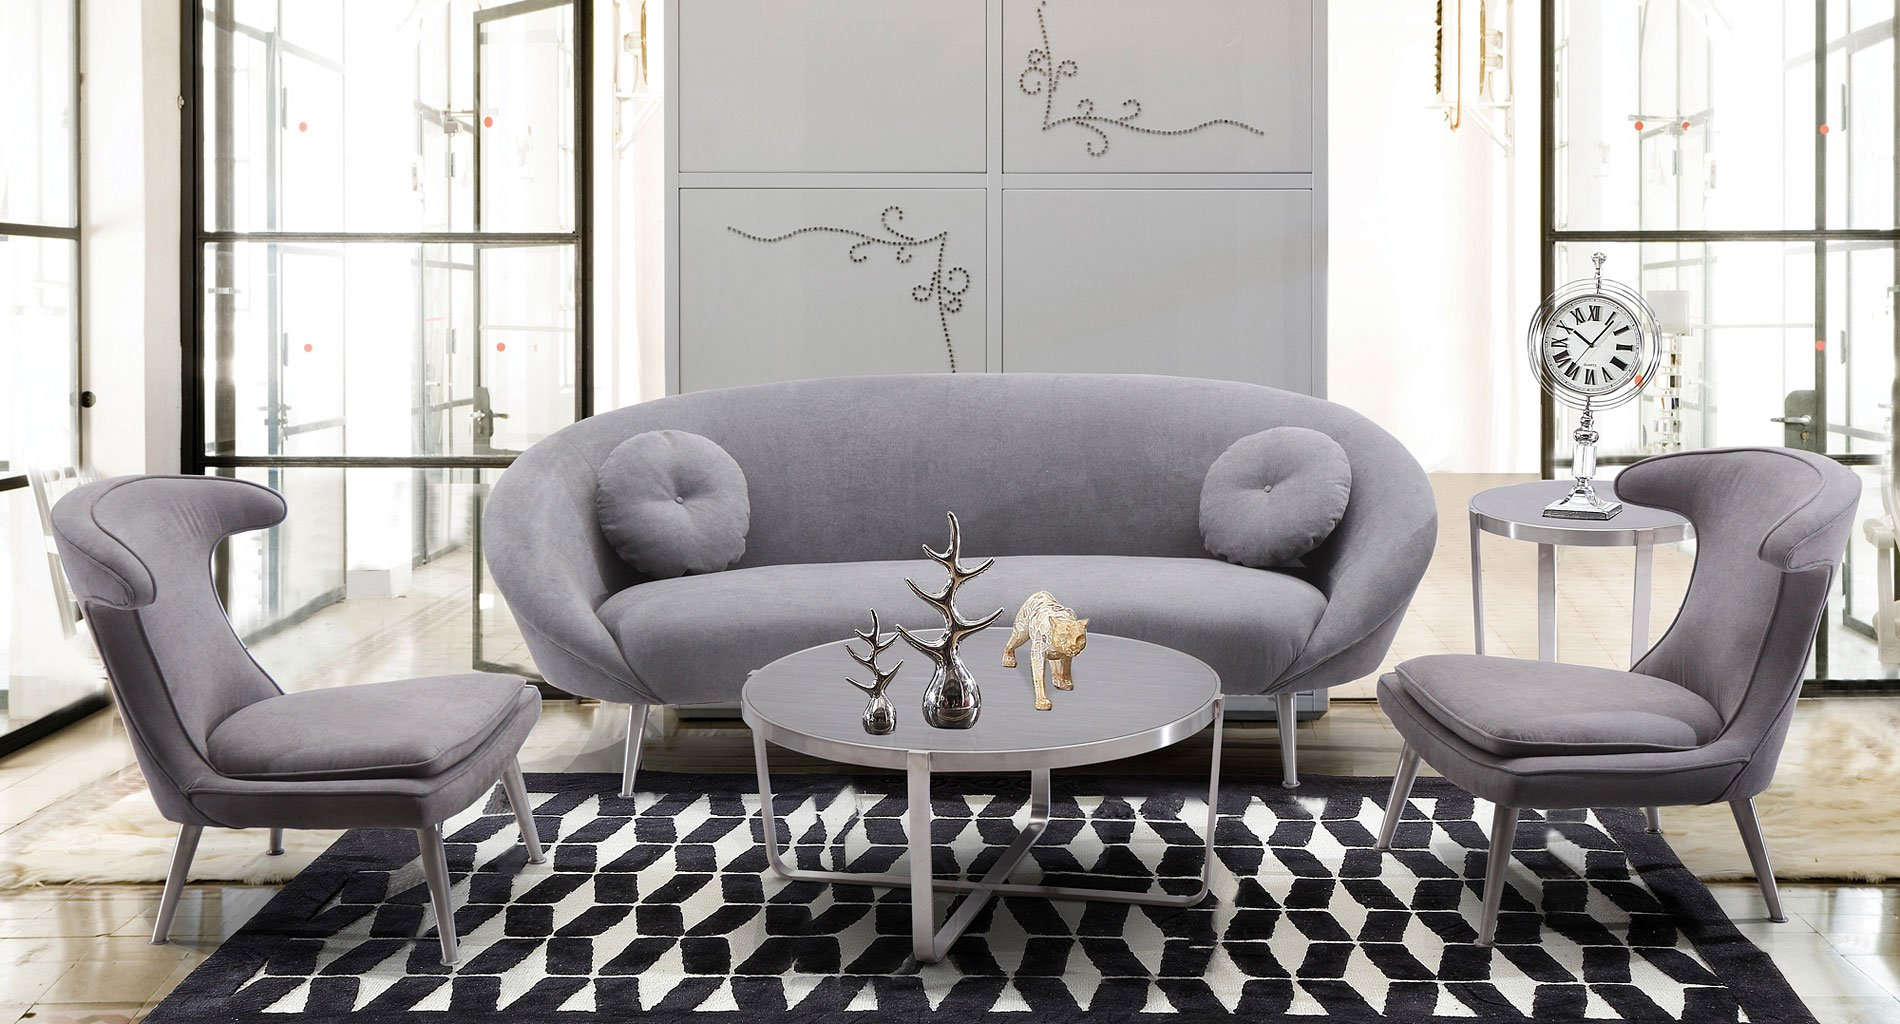 hollywood living room set lcho3mi lcmachmi armen living